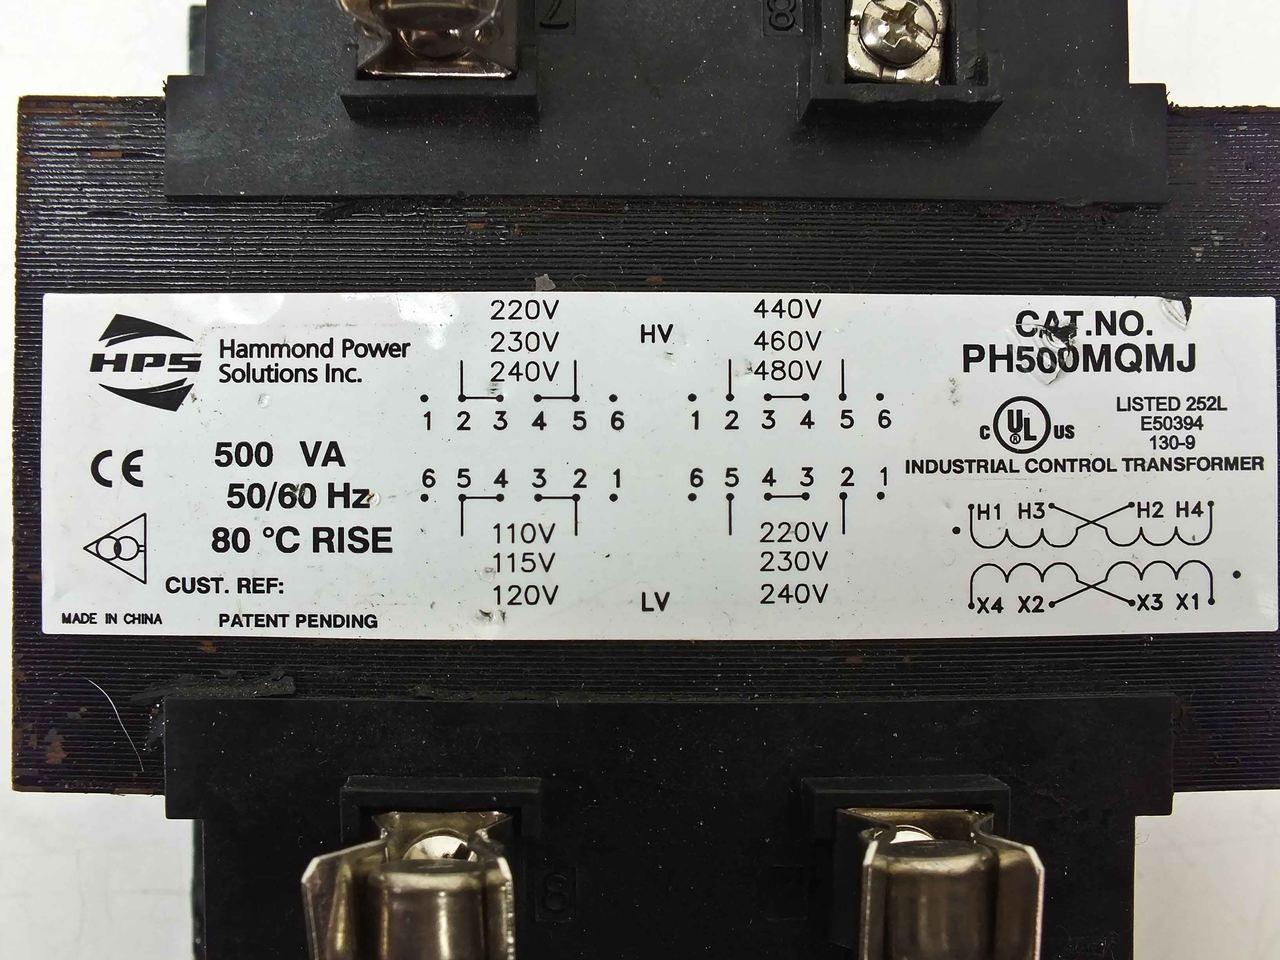 Hammond Power Solutions Industrial Control Transformer (PH500MQMJ) on